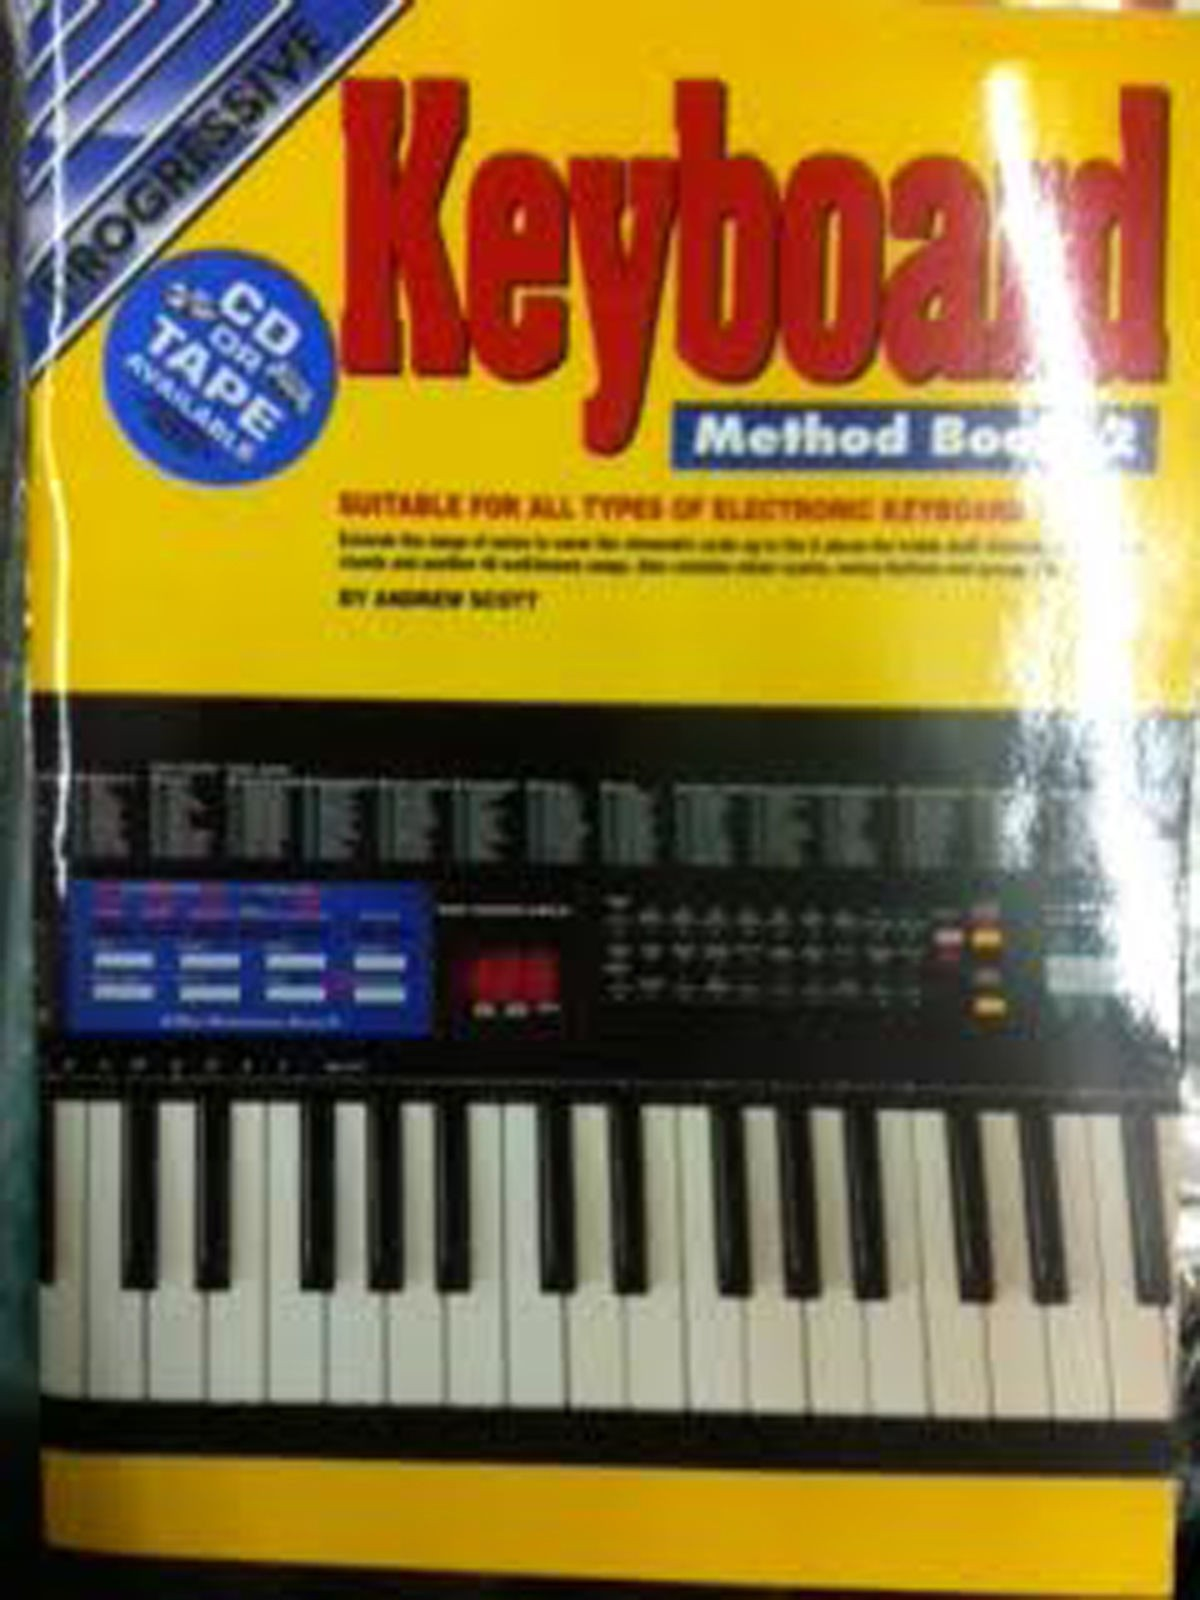 Progressive Keyboard Method Book 2 Tutor Sheet Music Beginner Learn to Play S78